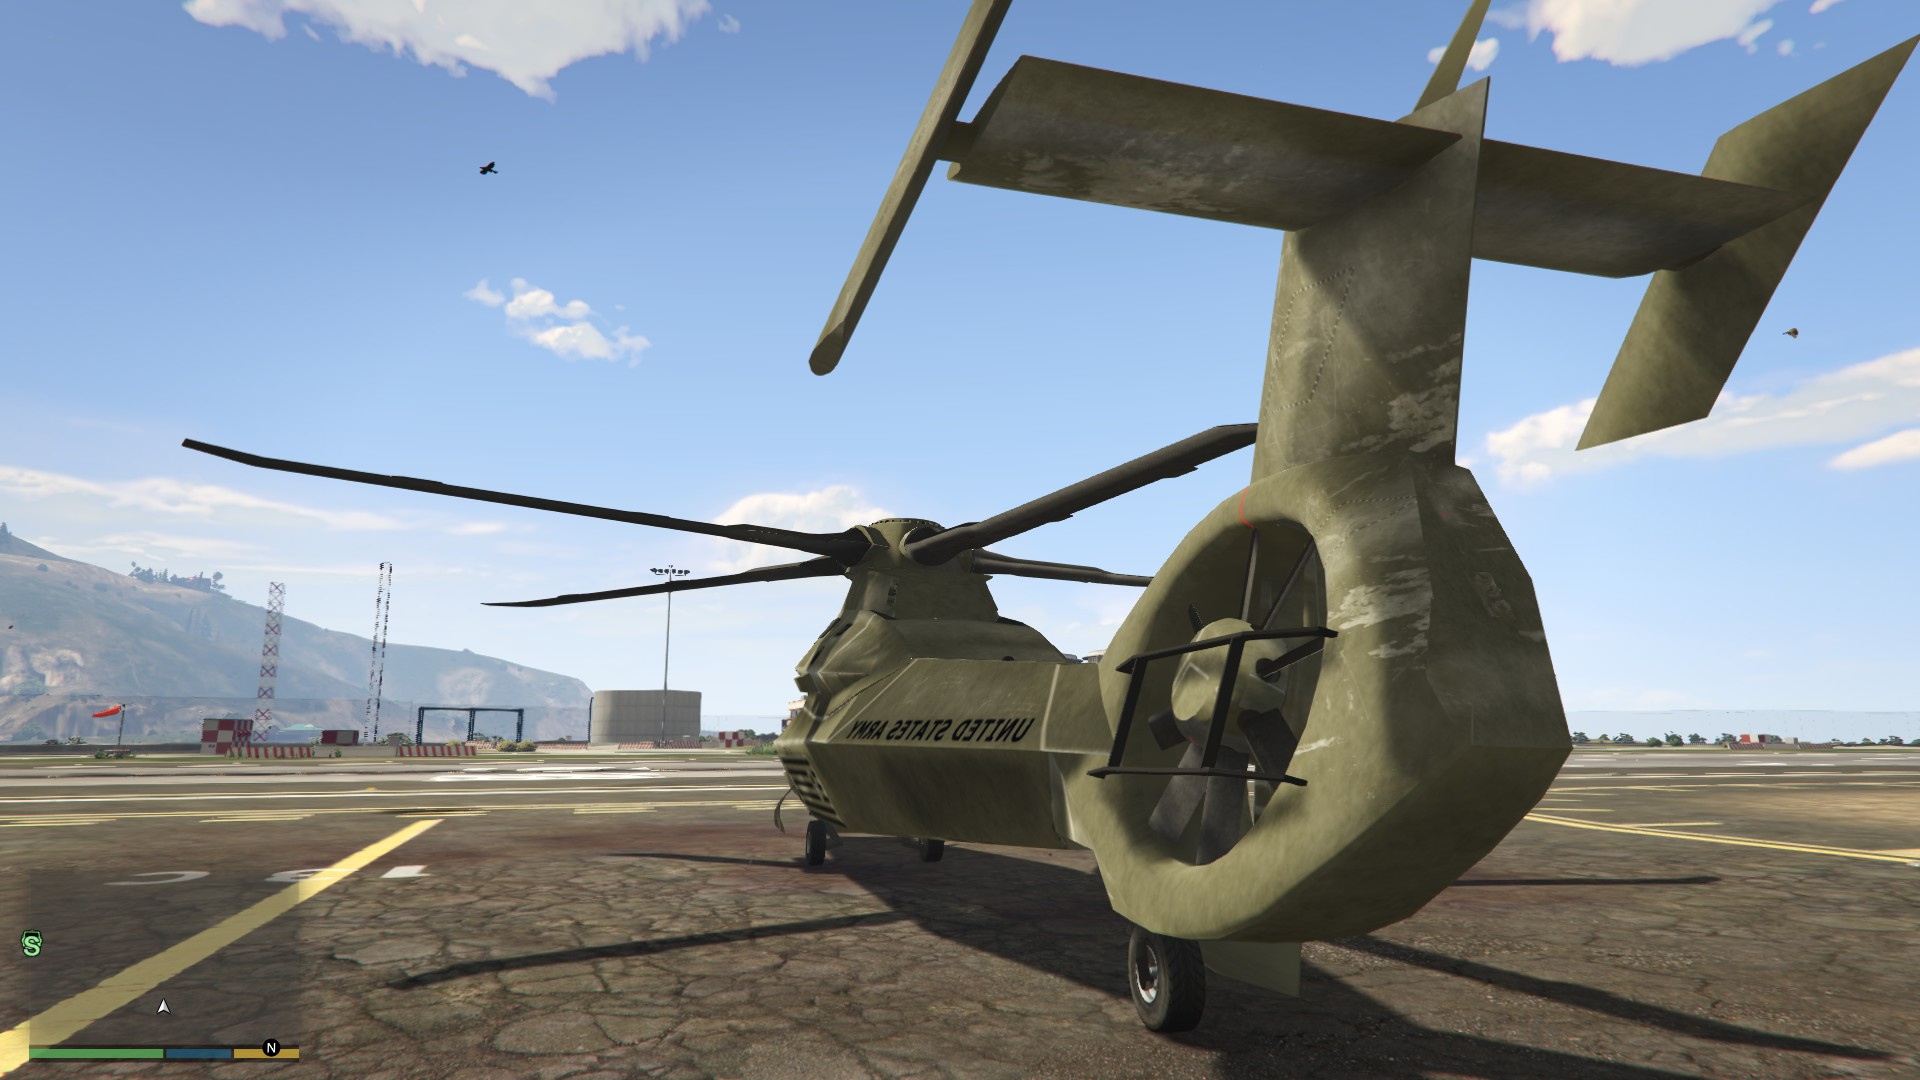 Comanche Helicopter 39670 Mediabin